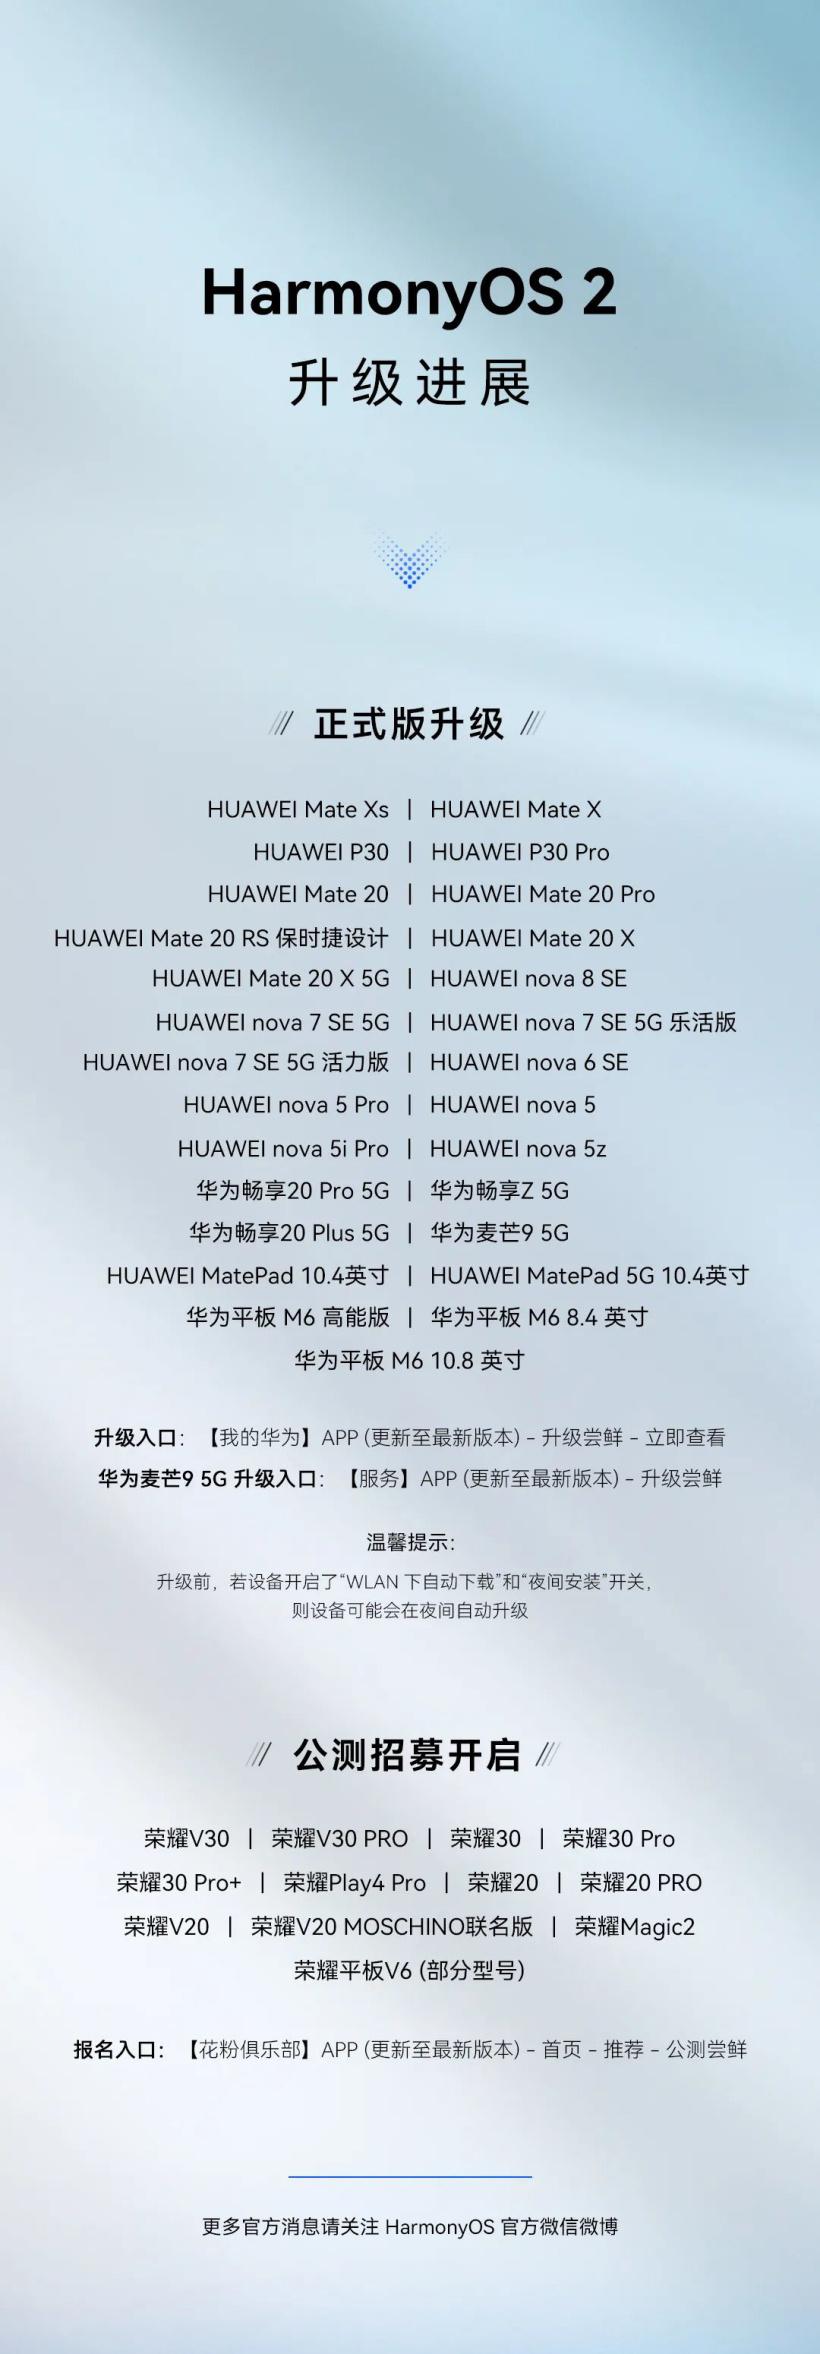 HarmonyOS 2正式版来了:华为27款老机型可升